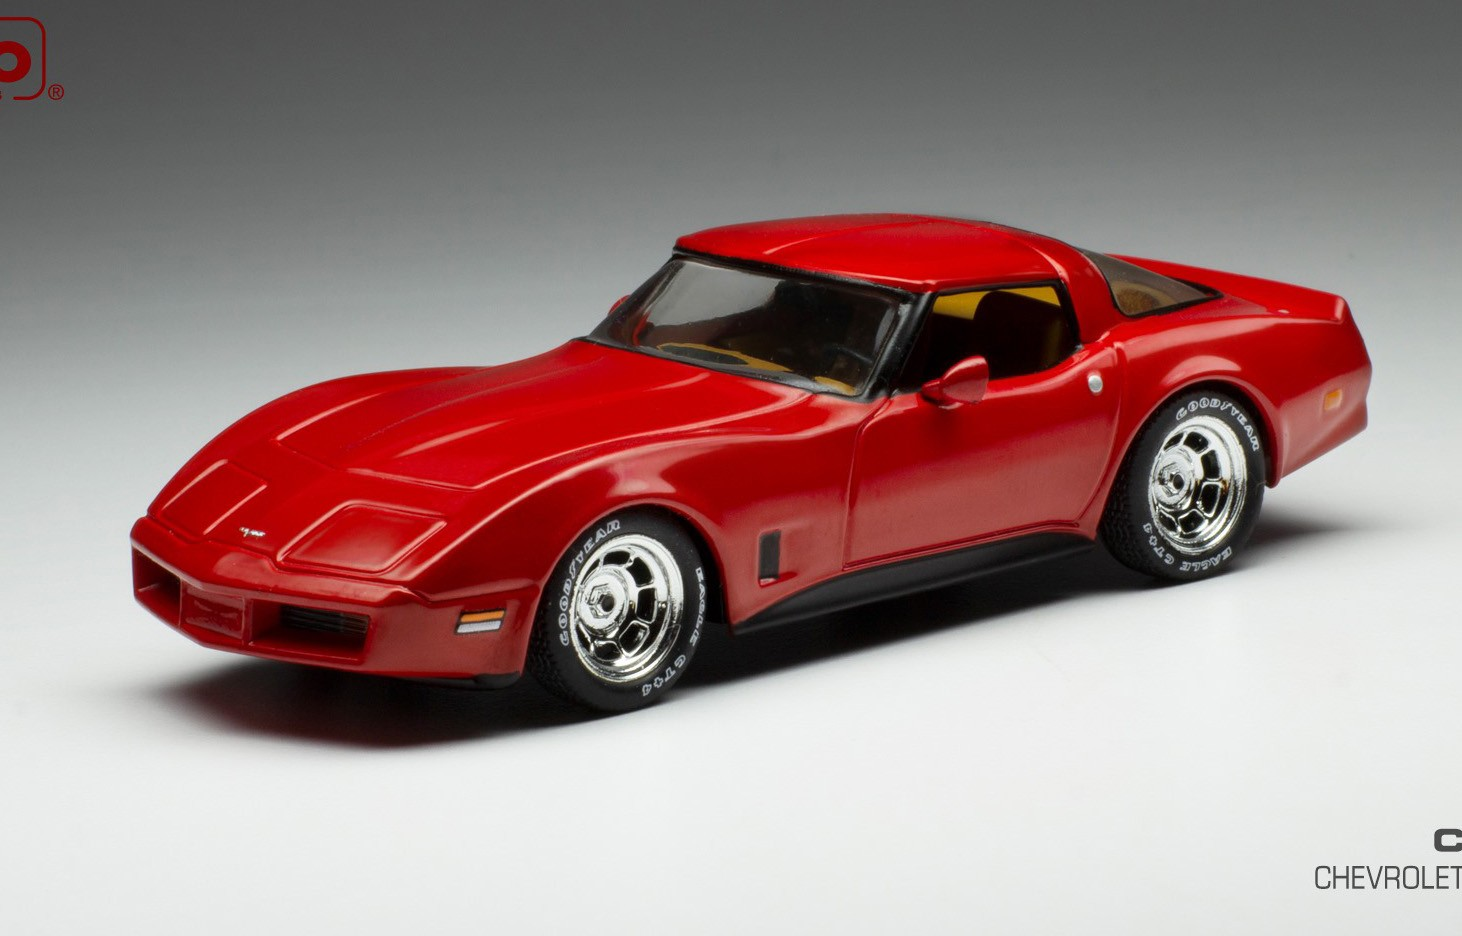 1:43 Ixo Chevrolet Corvette C3 1980 red